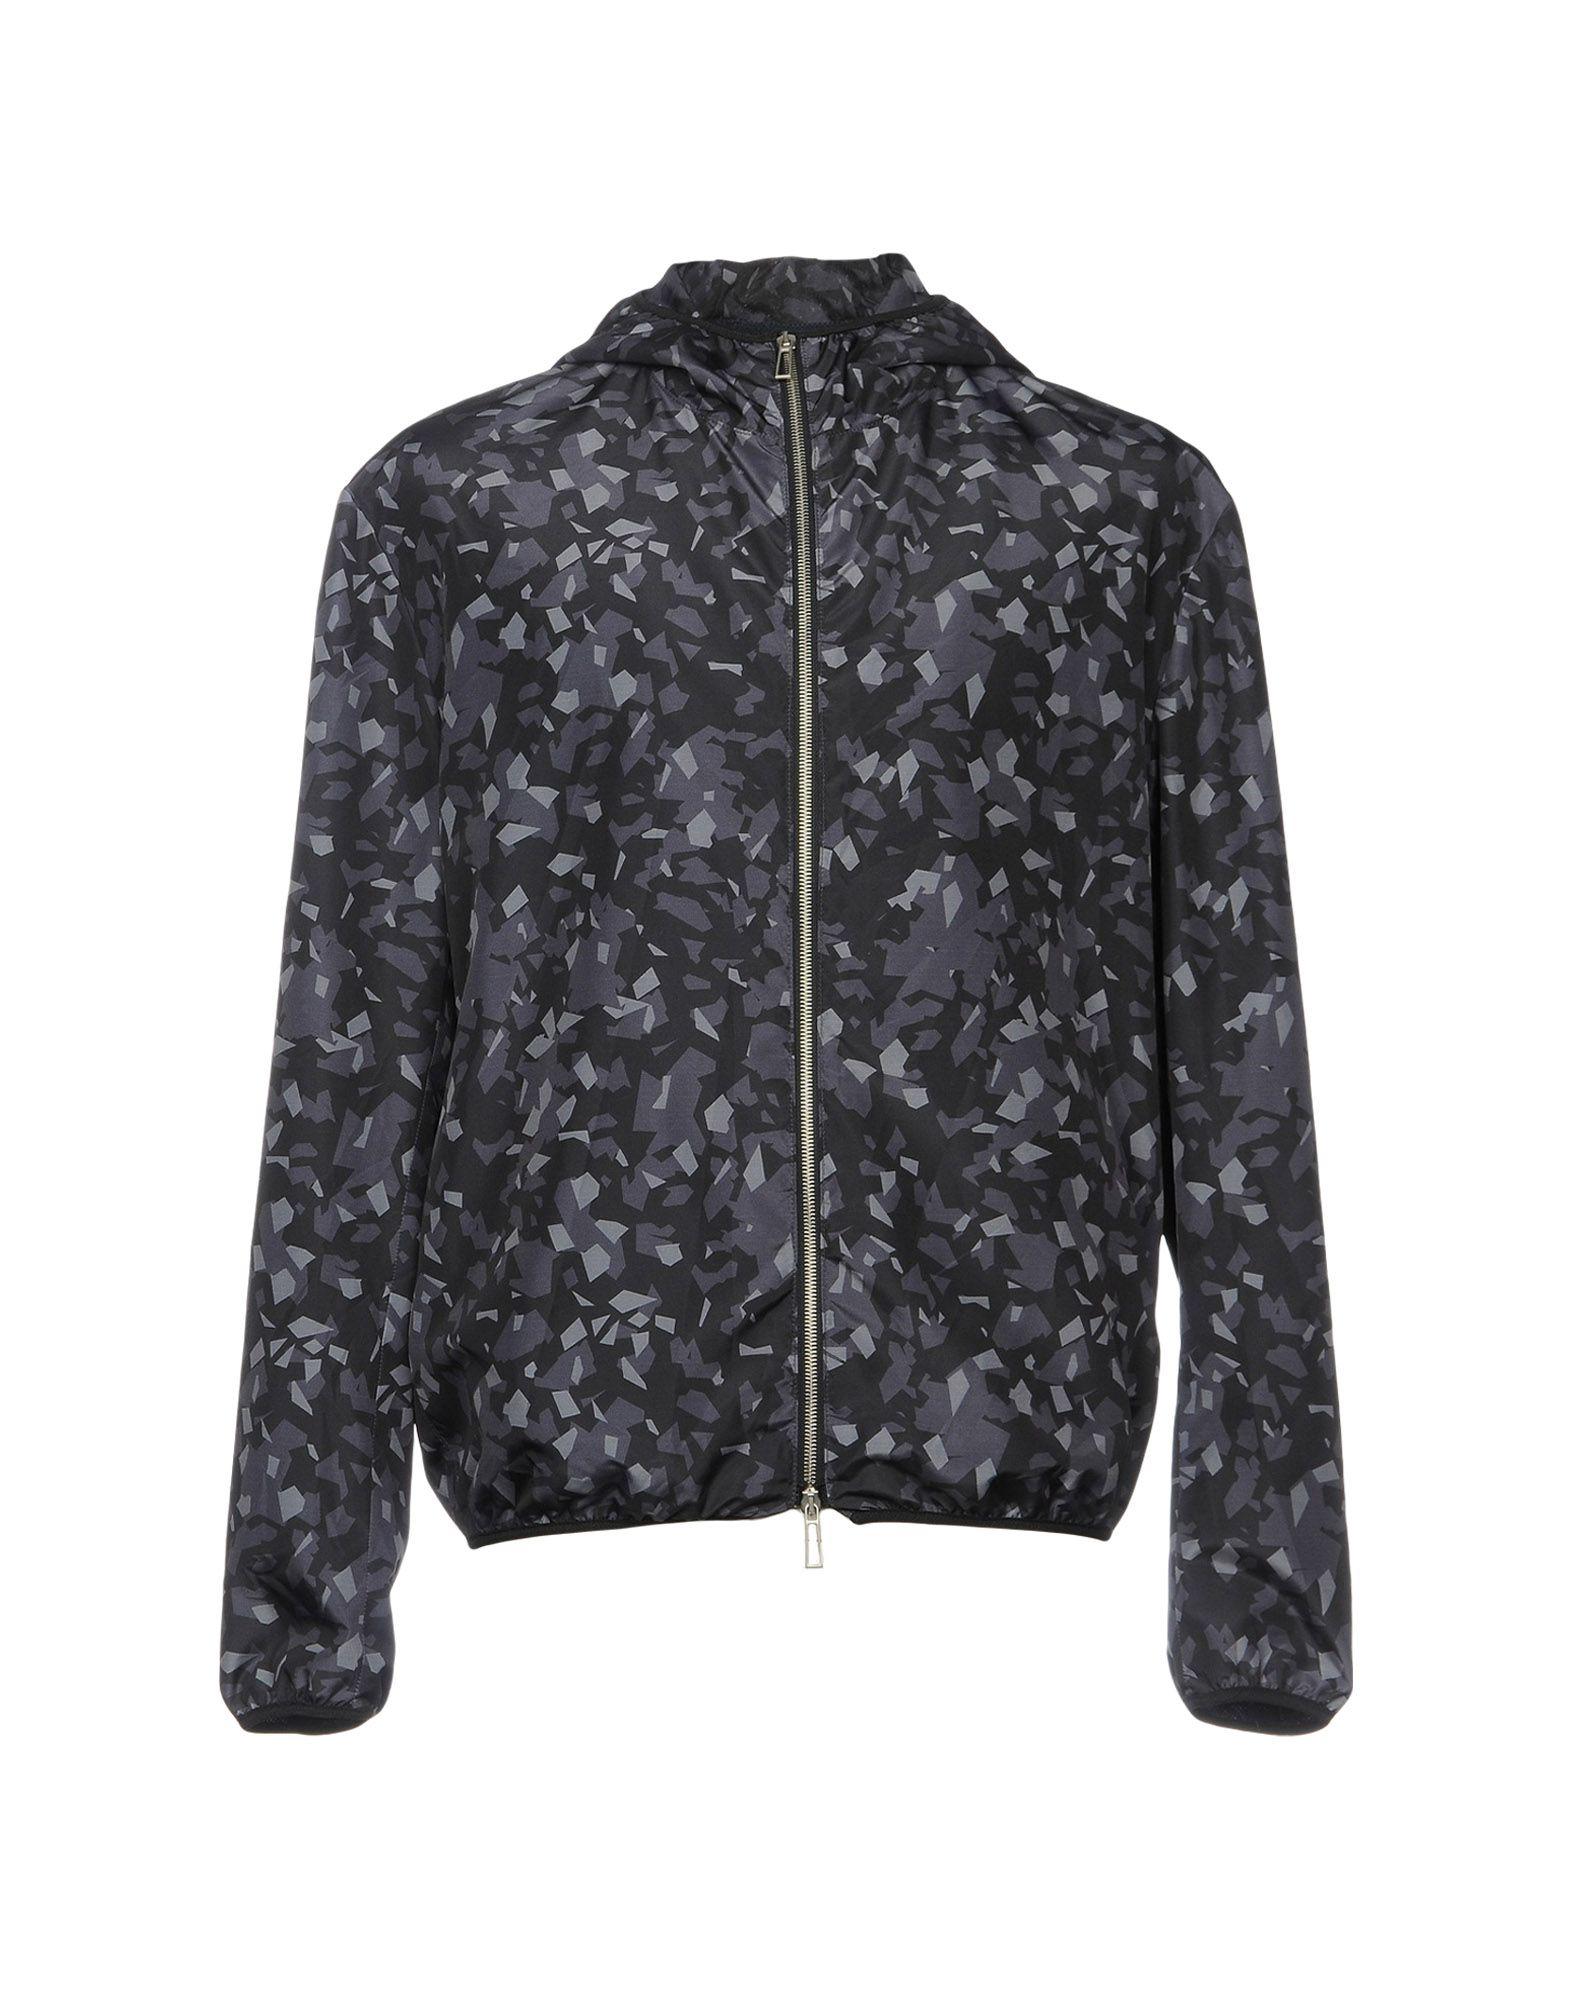 hōsio джинсовая верхняя одежда HōSIO Куртка